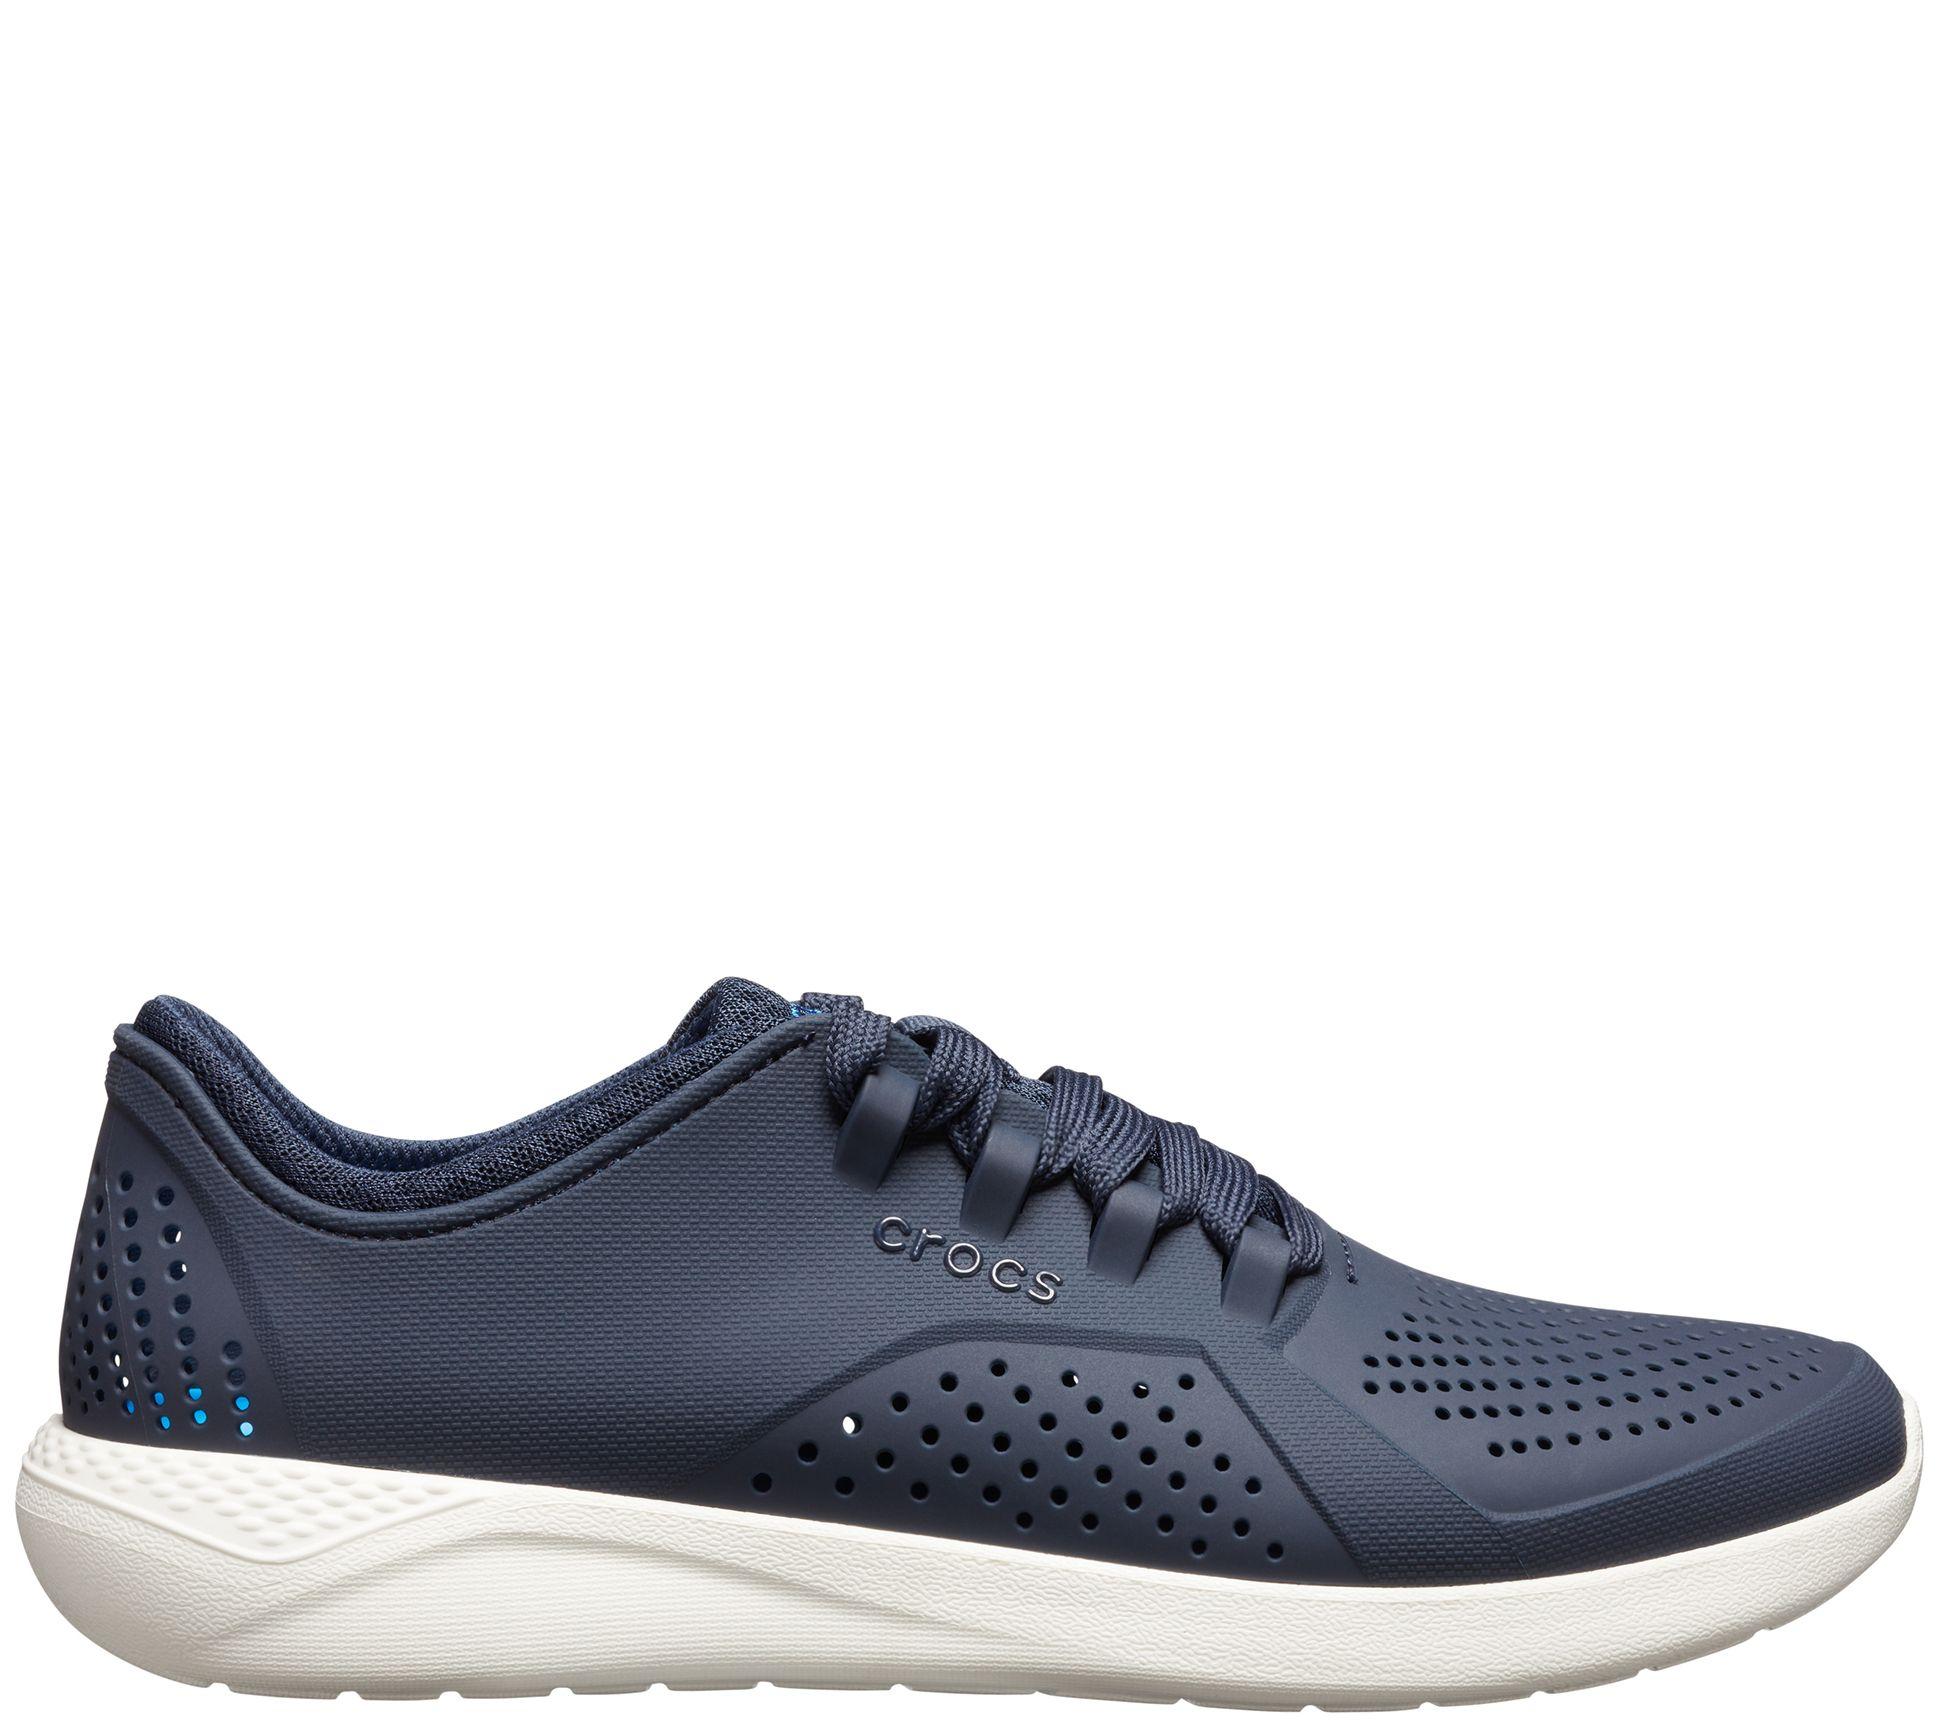 932f693bb659f2 Crocs LiteRide Pacer Men s Sneakers - Page 1 — QVC.com